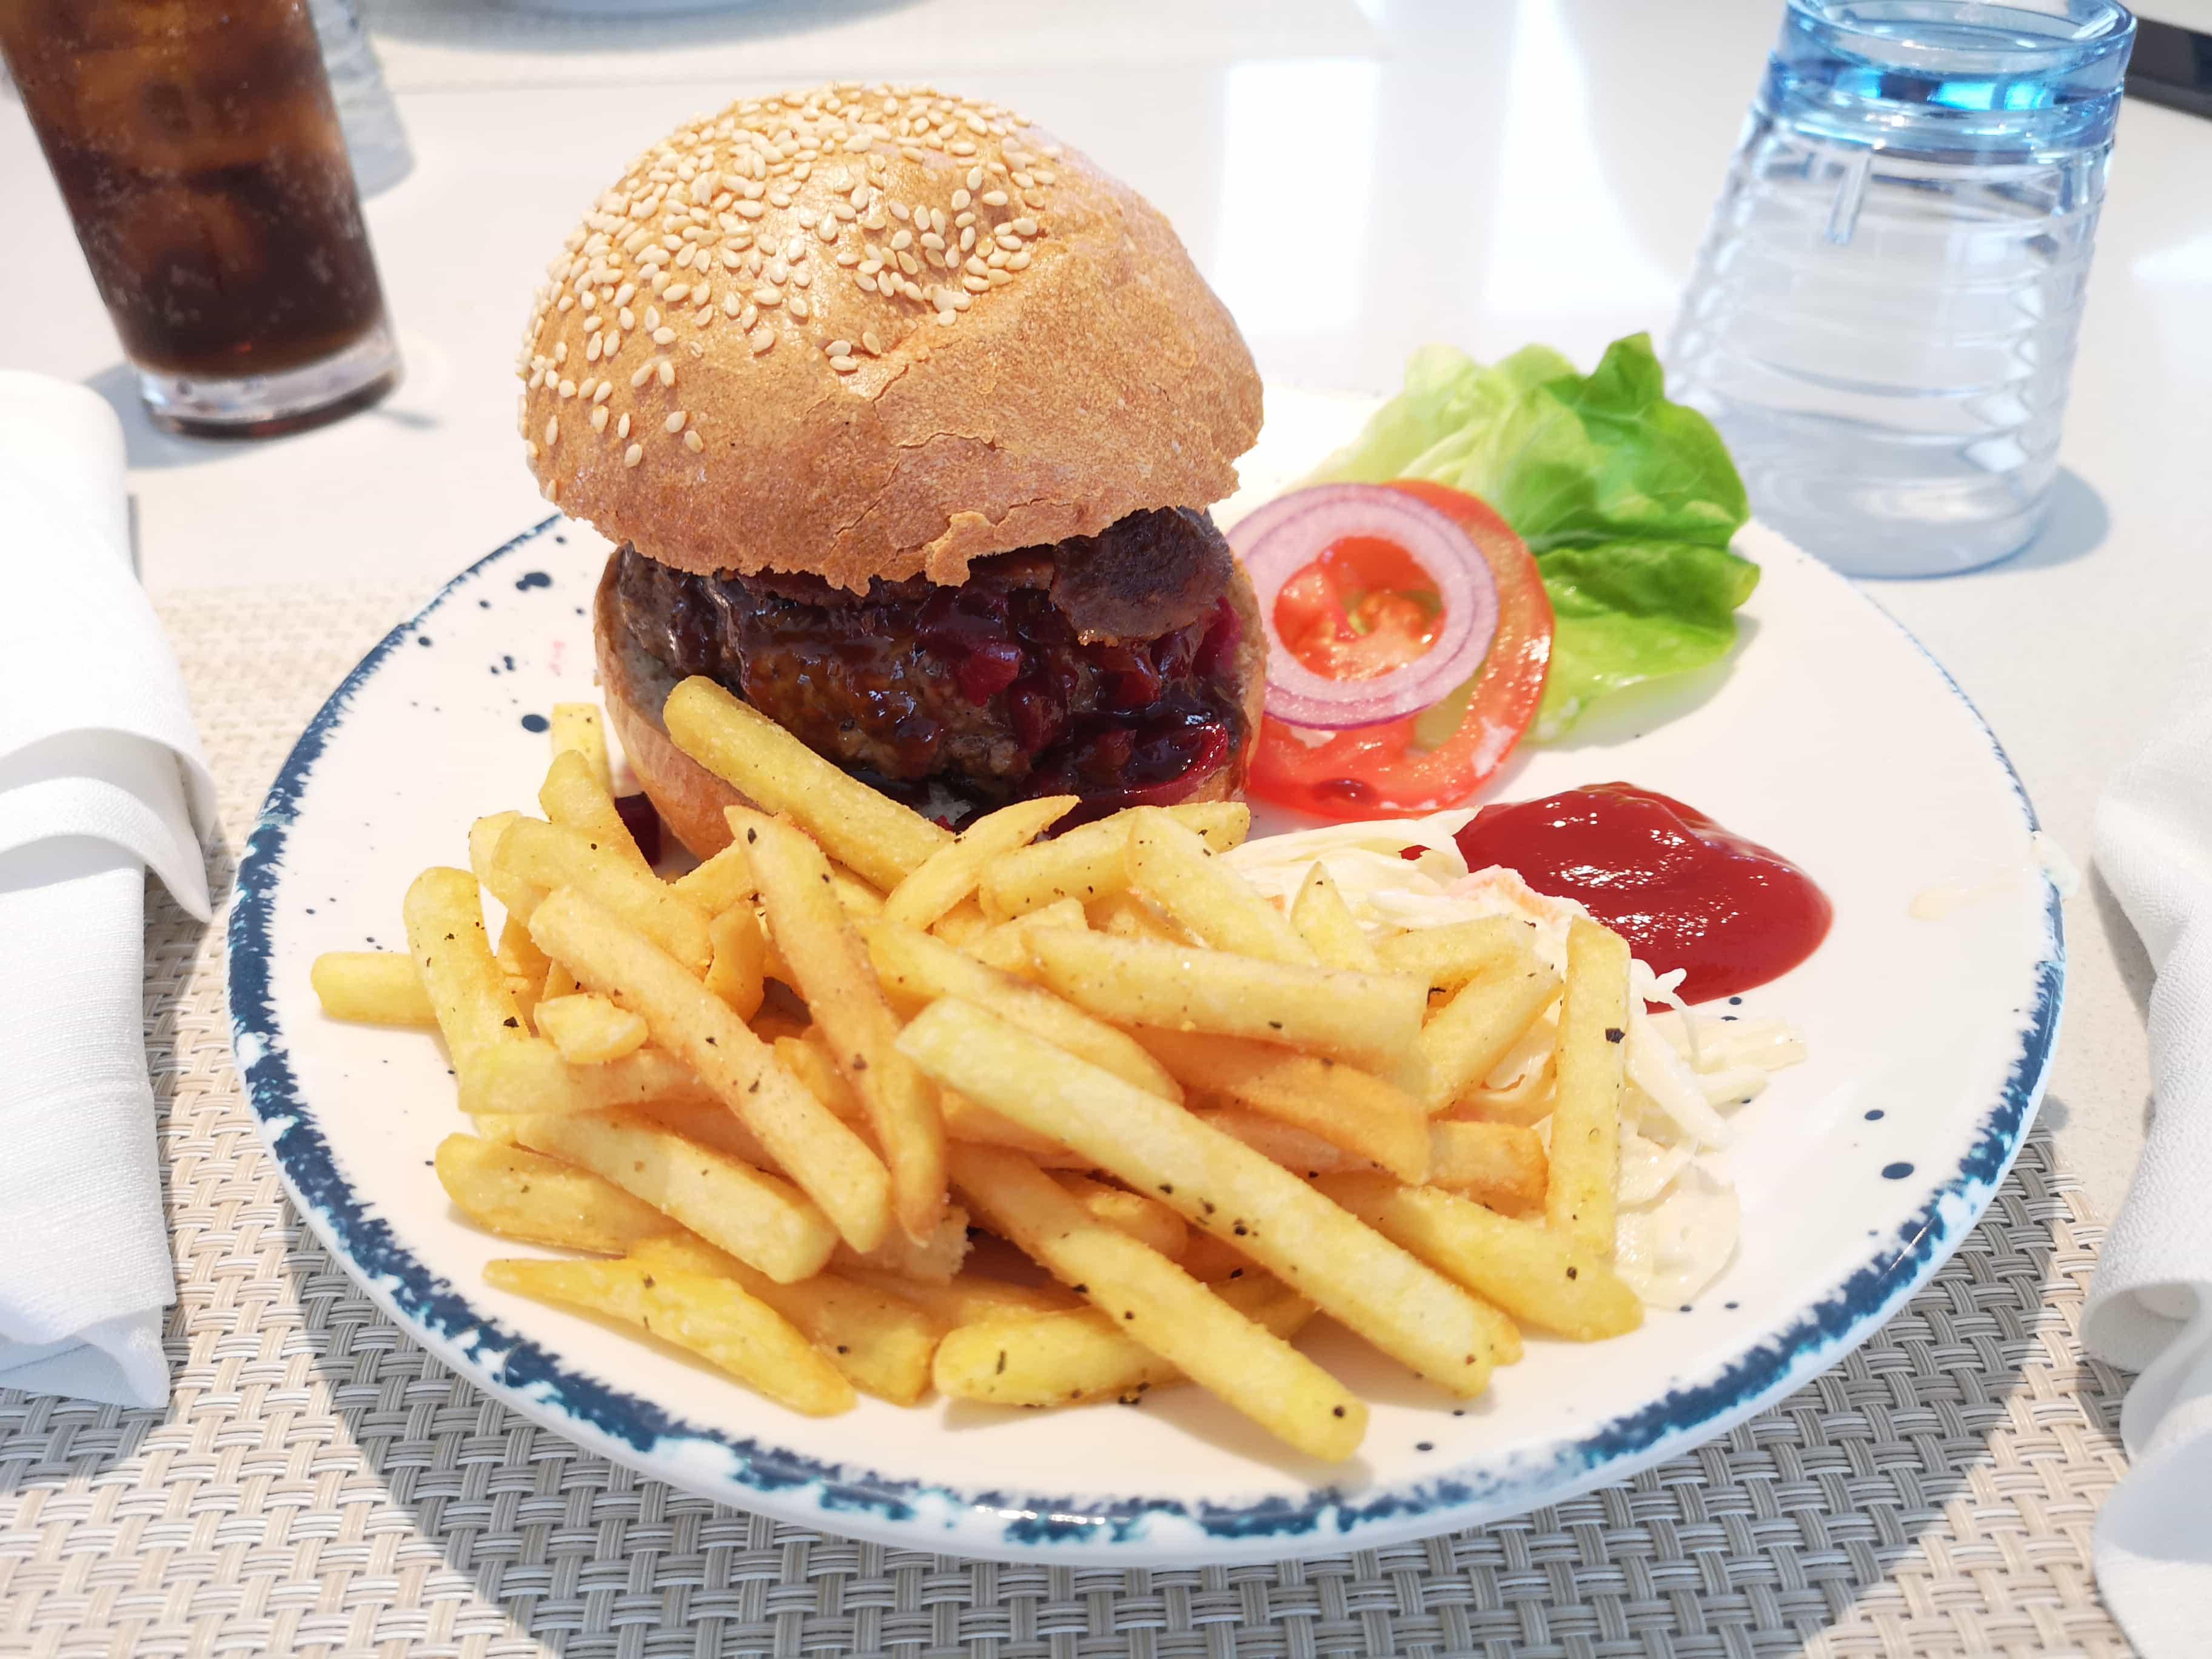 Viking Sea Cruises Pool Grill Food Burger Chips Coleslaw